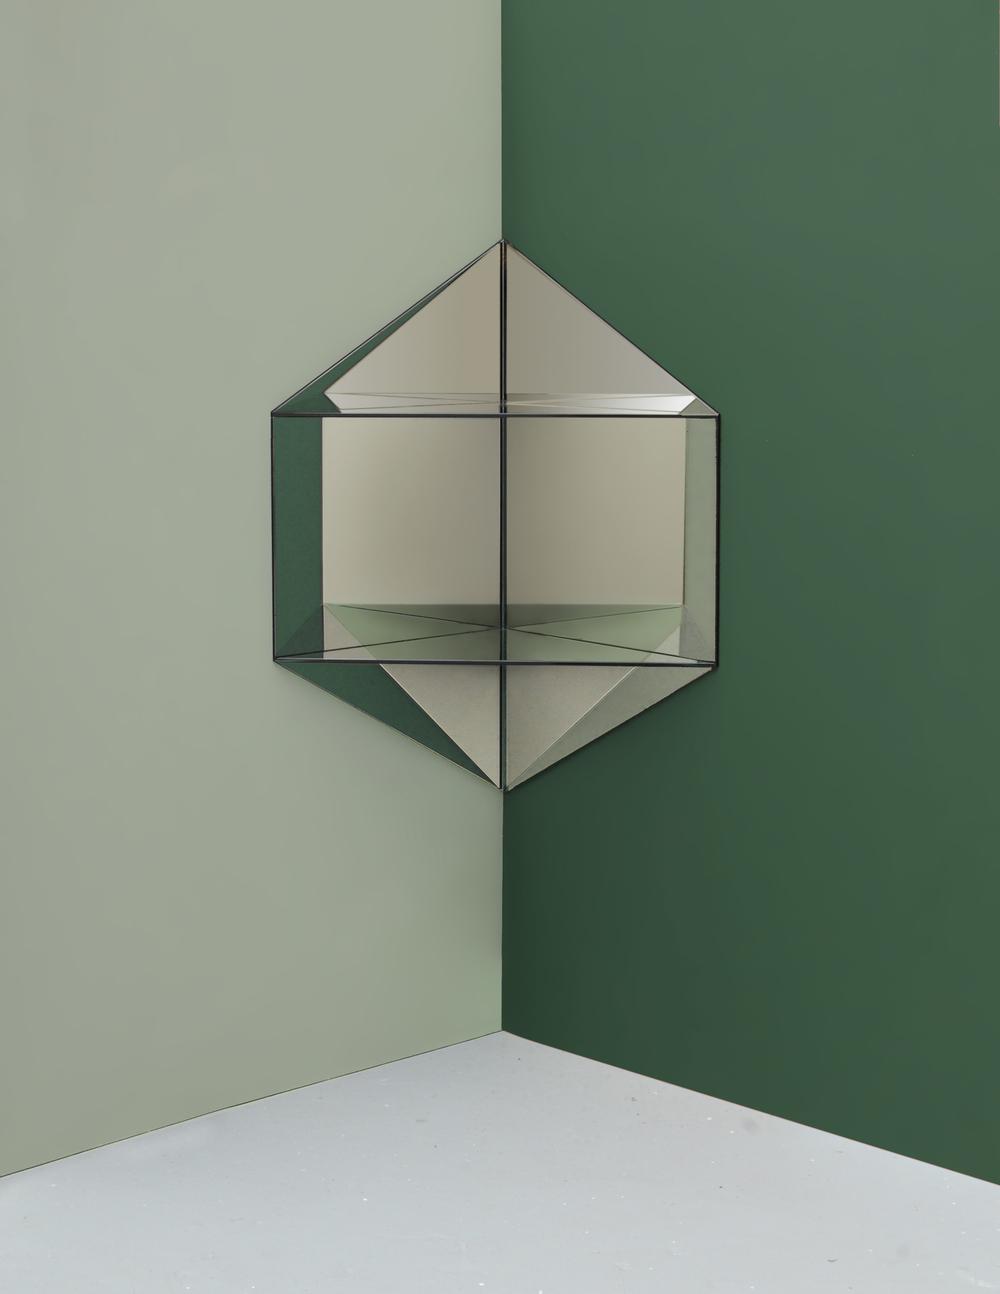 LG Studio_Mirage_Shelf_hexagon.jpg